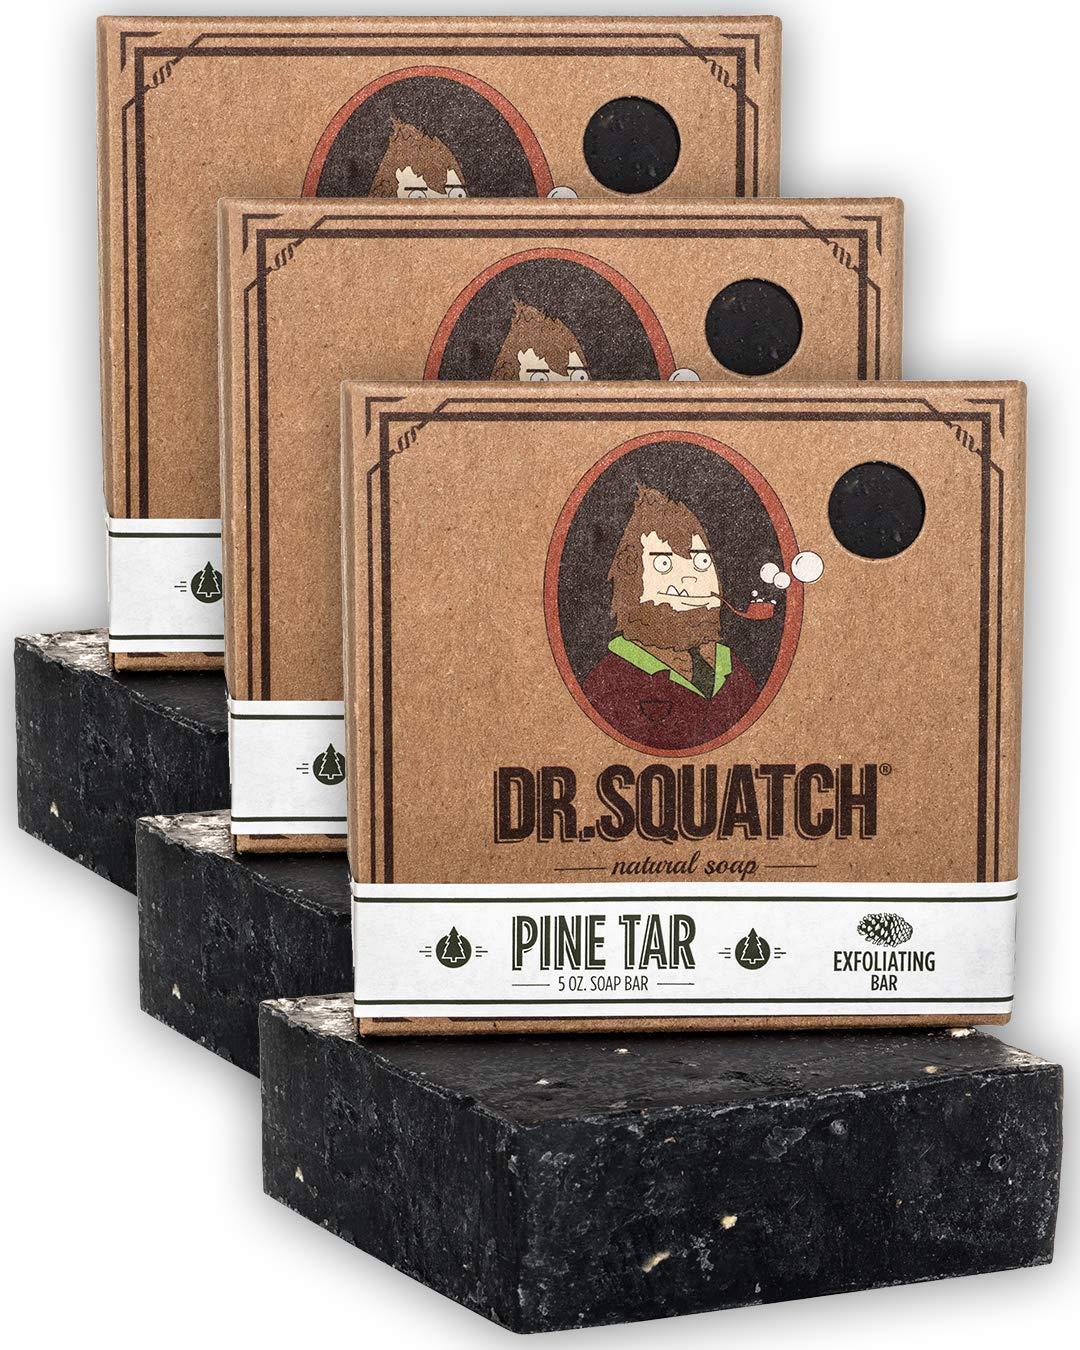 Dr. Squatch Men's Soap Sampler Pack (3 Bars) – Pine Tar, Cedar Citrus, Bay Rum Bars – Natural Manly Scented Organic Soap for Men (3 Bar Bundle Set) : Beauty